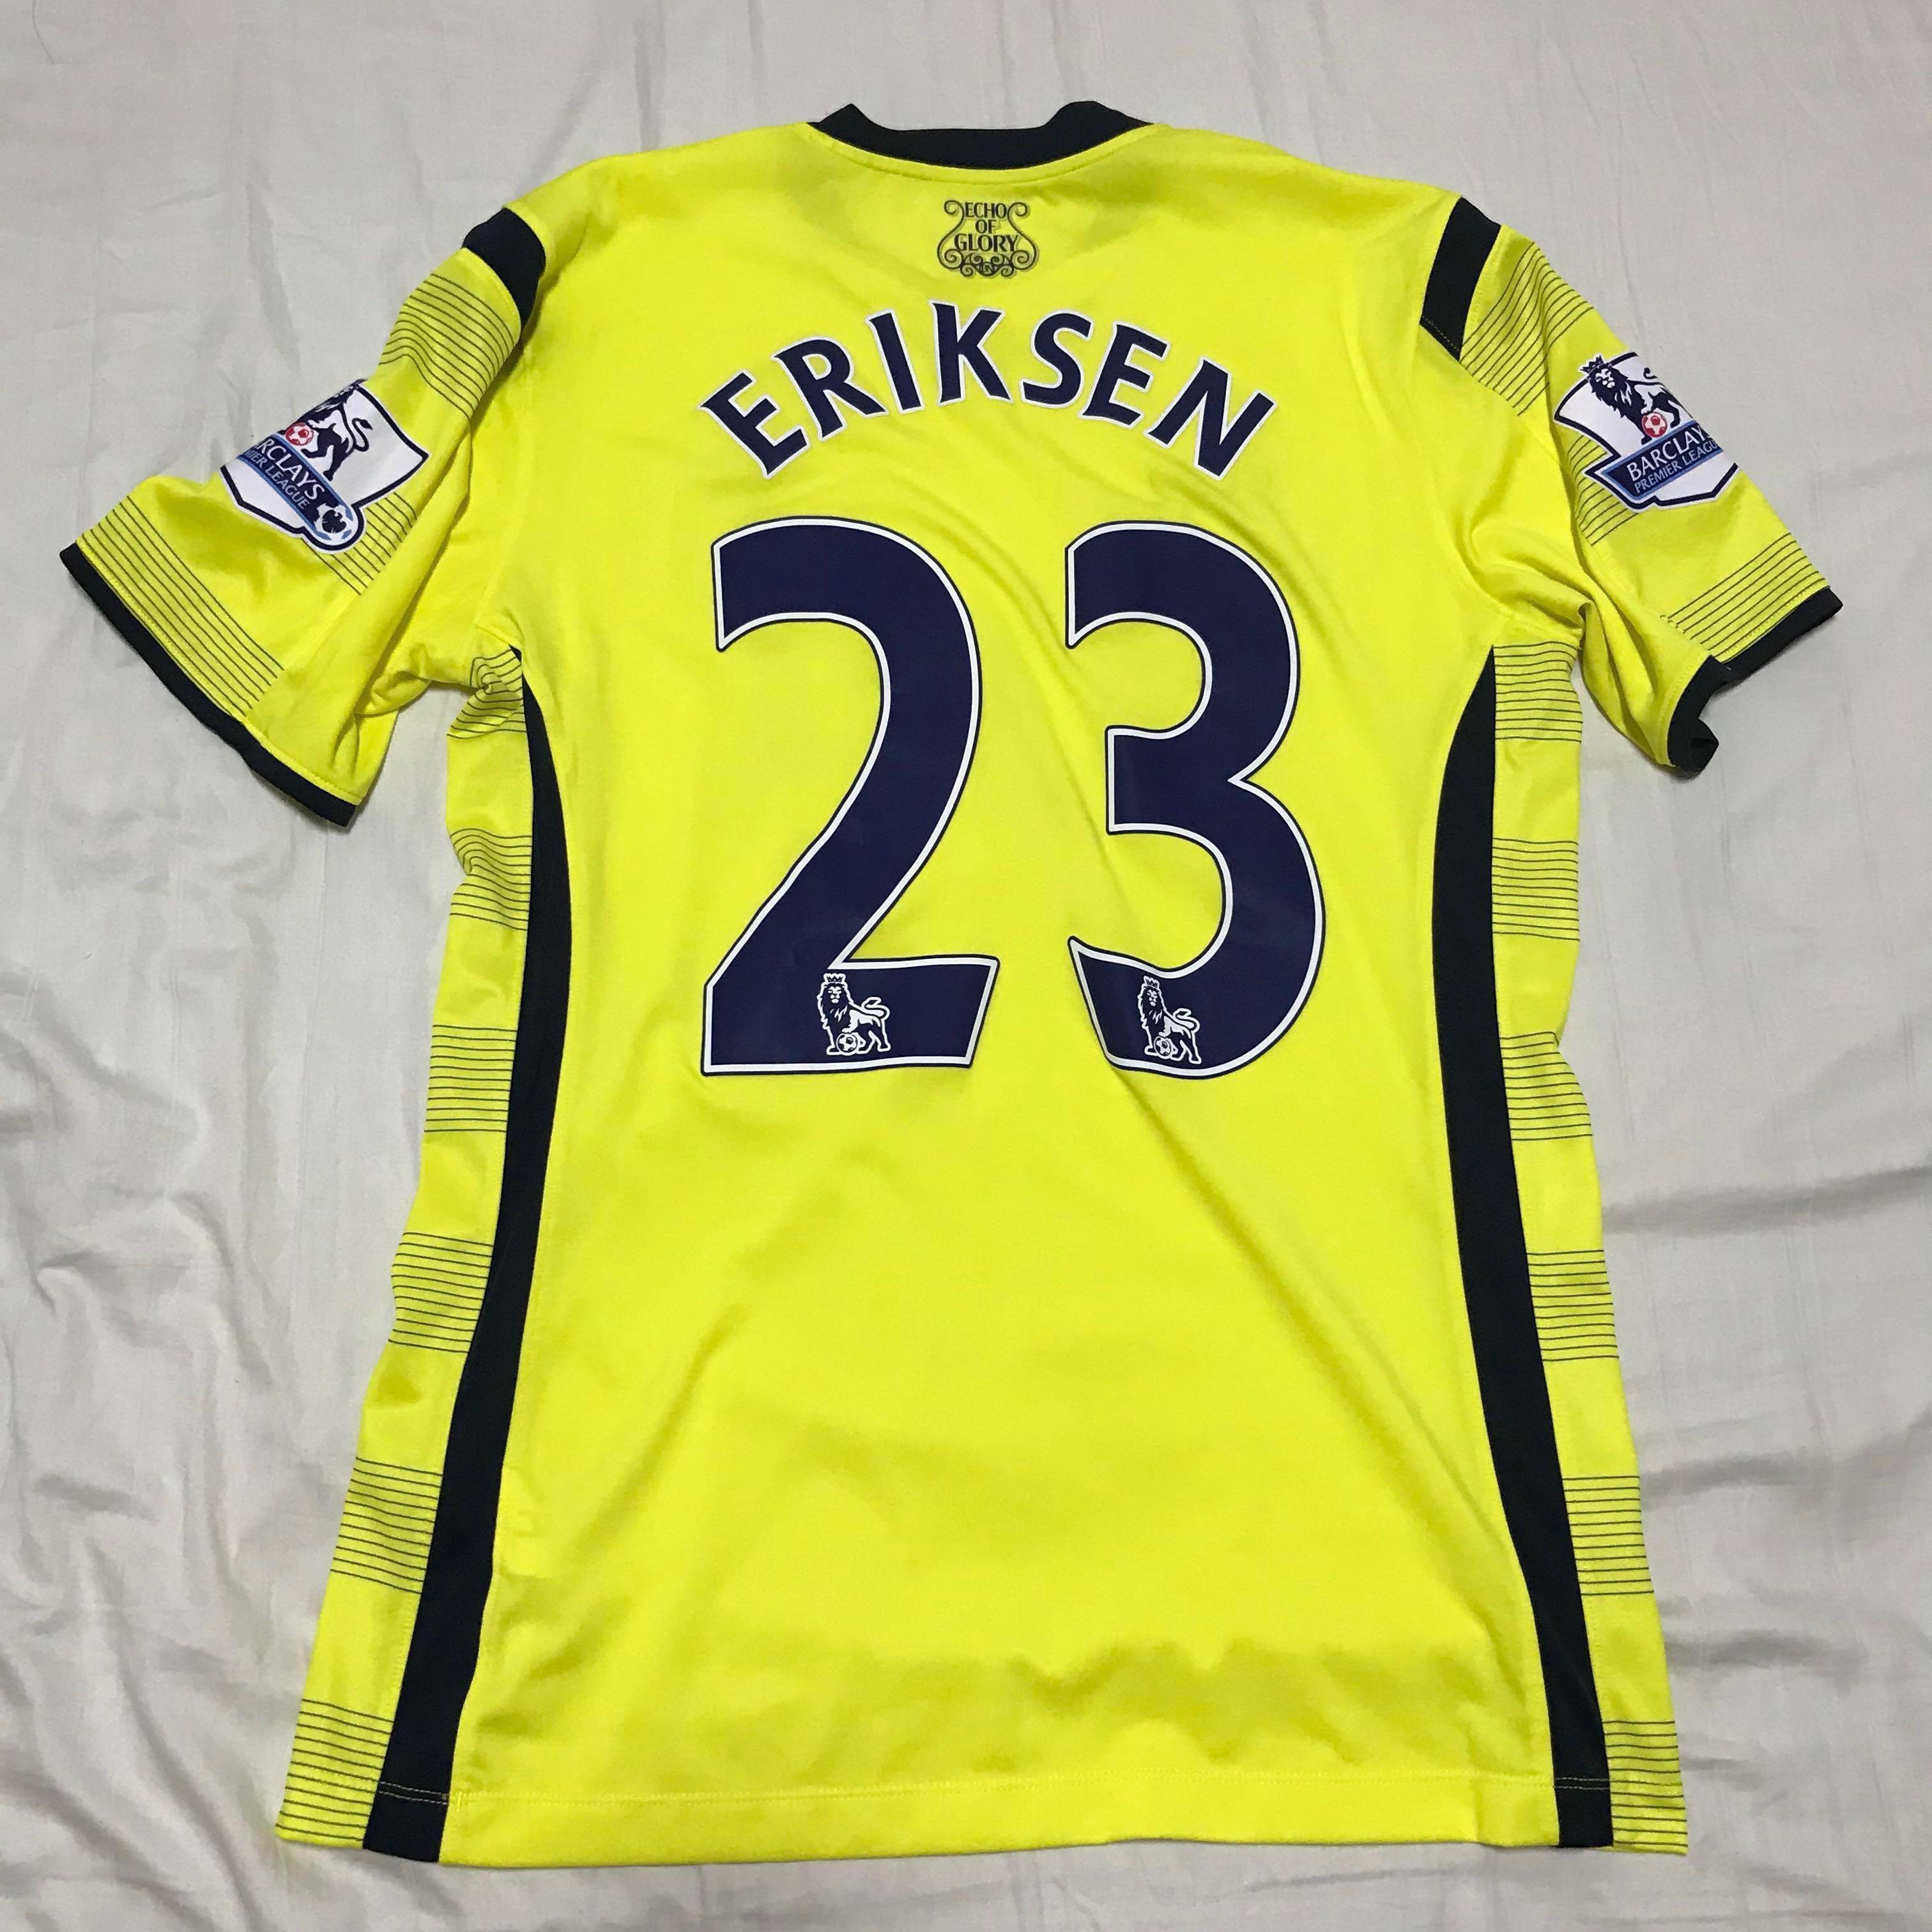 reputable site b2b61 f4430 UNDER ARMOUR Tottenham Hotspur 14/15 Third Kit (Eriksen#23/L ...